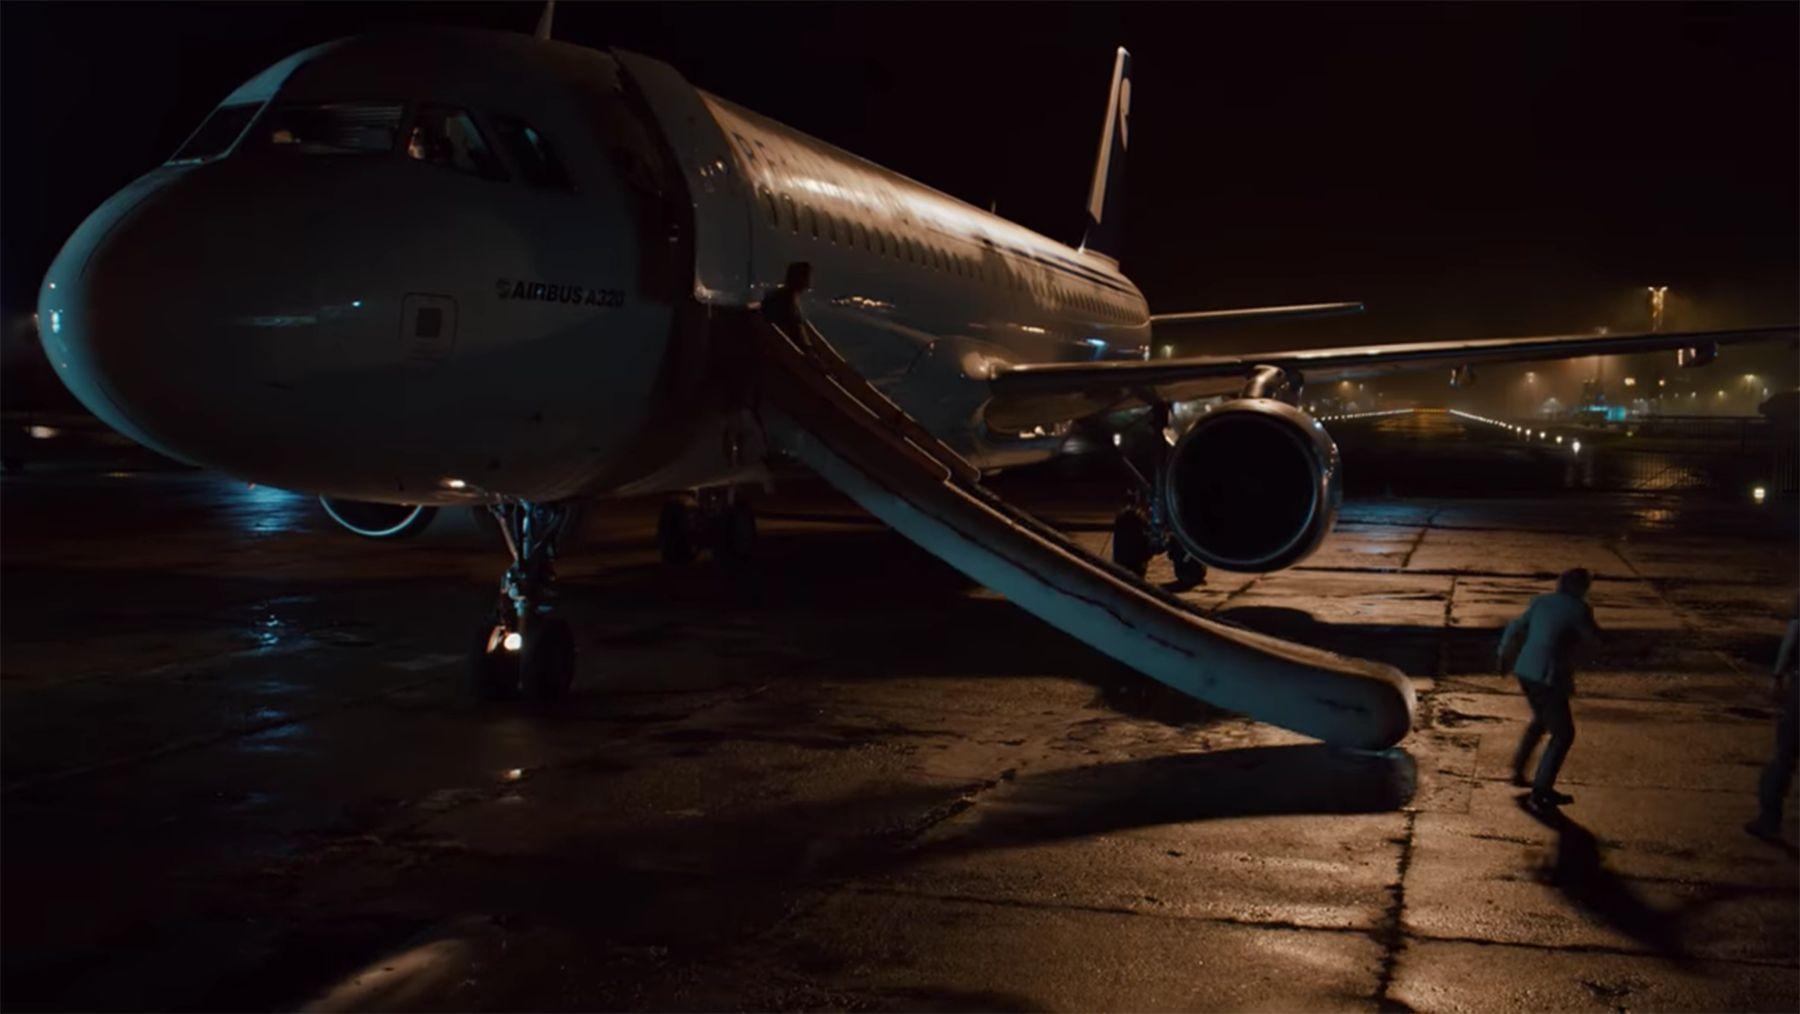 Trailer: Into the night | Kino/TV | Was is hier eigentlich los?